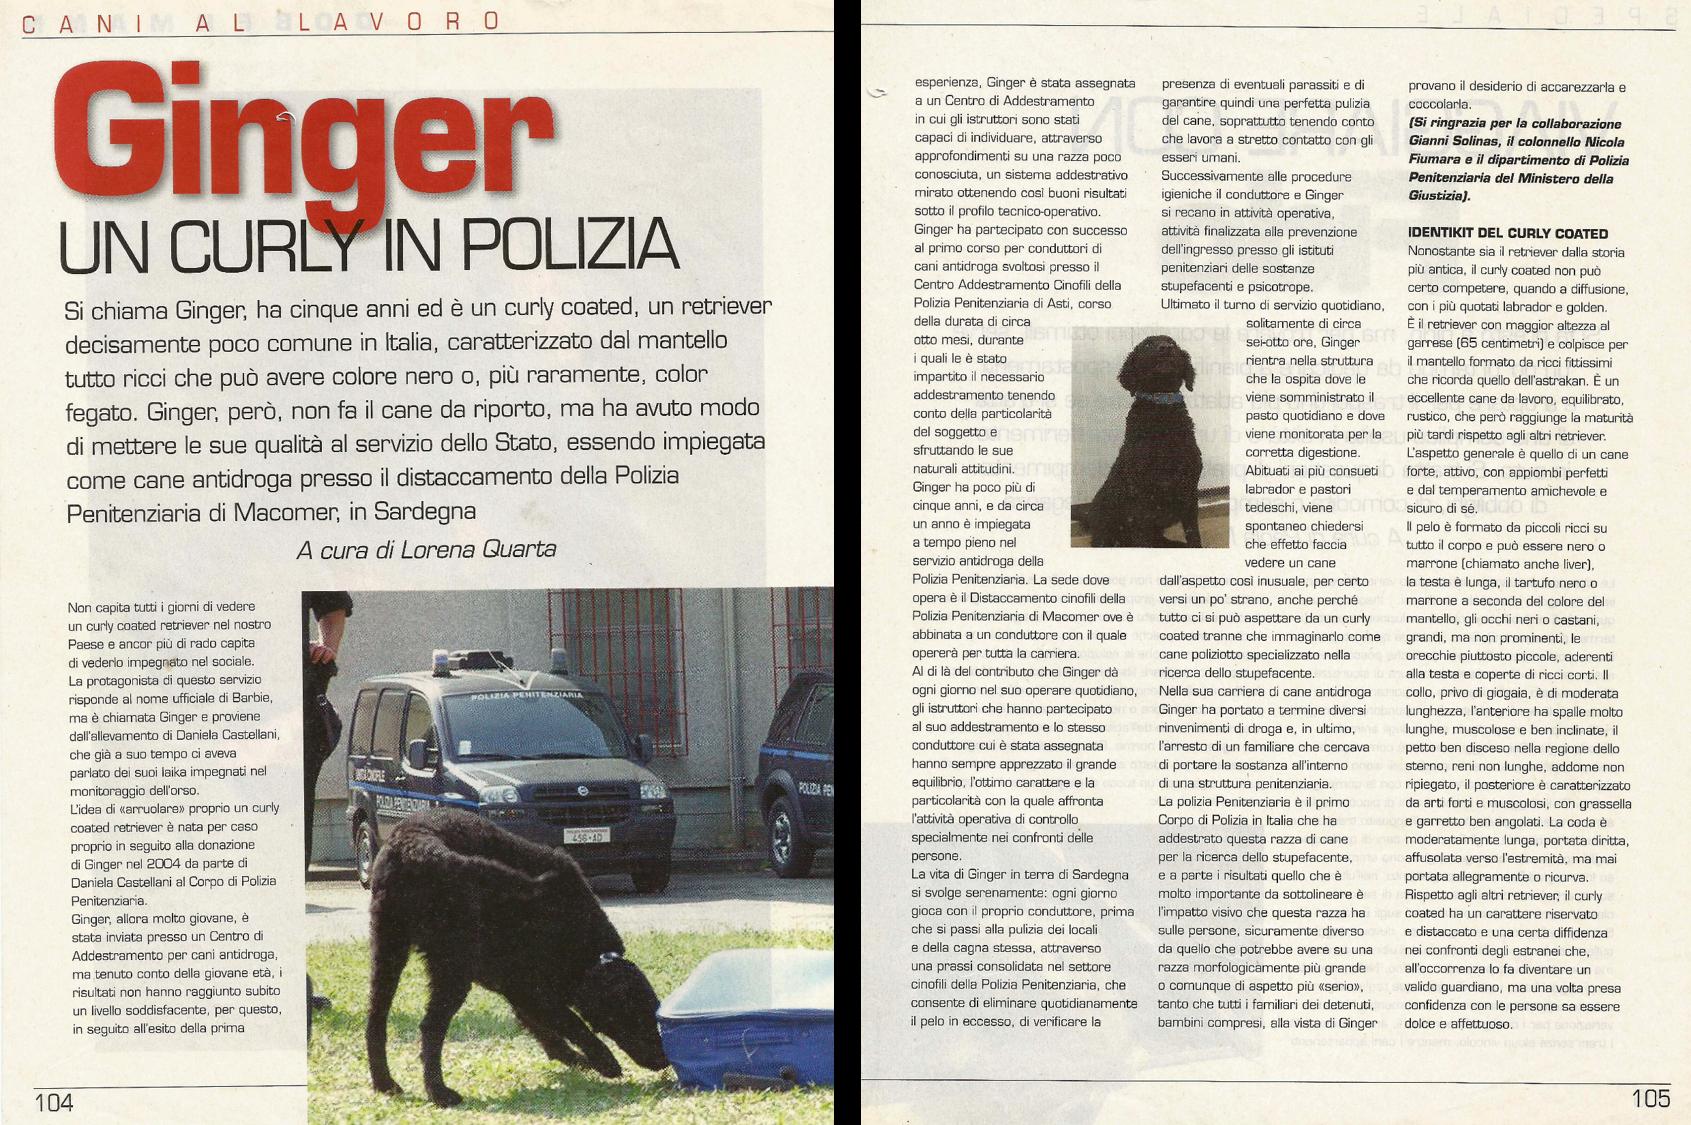 Ginger - Un Curly in Polizia